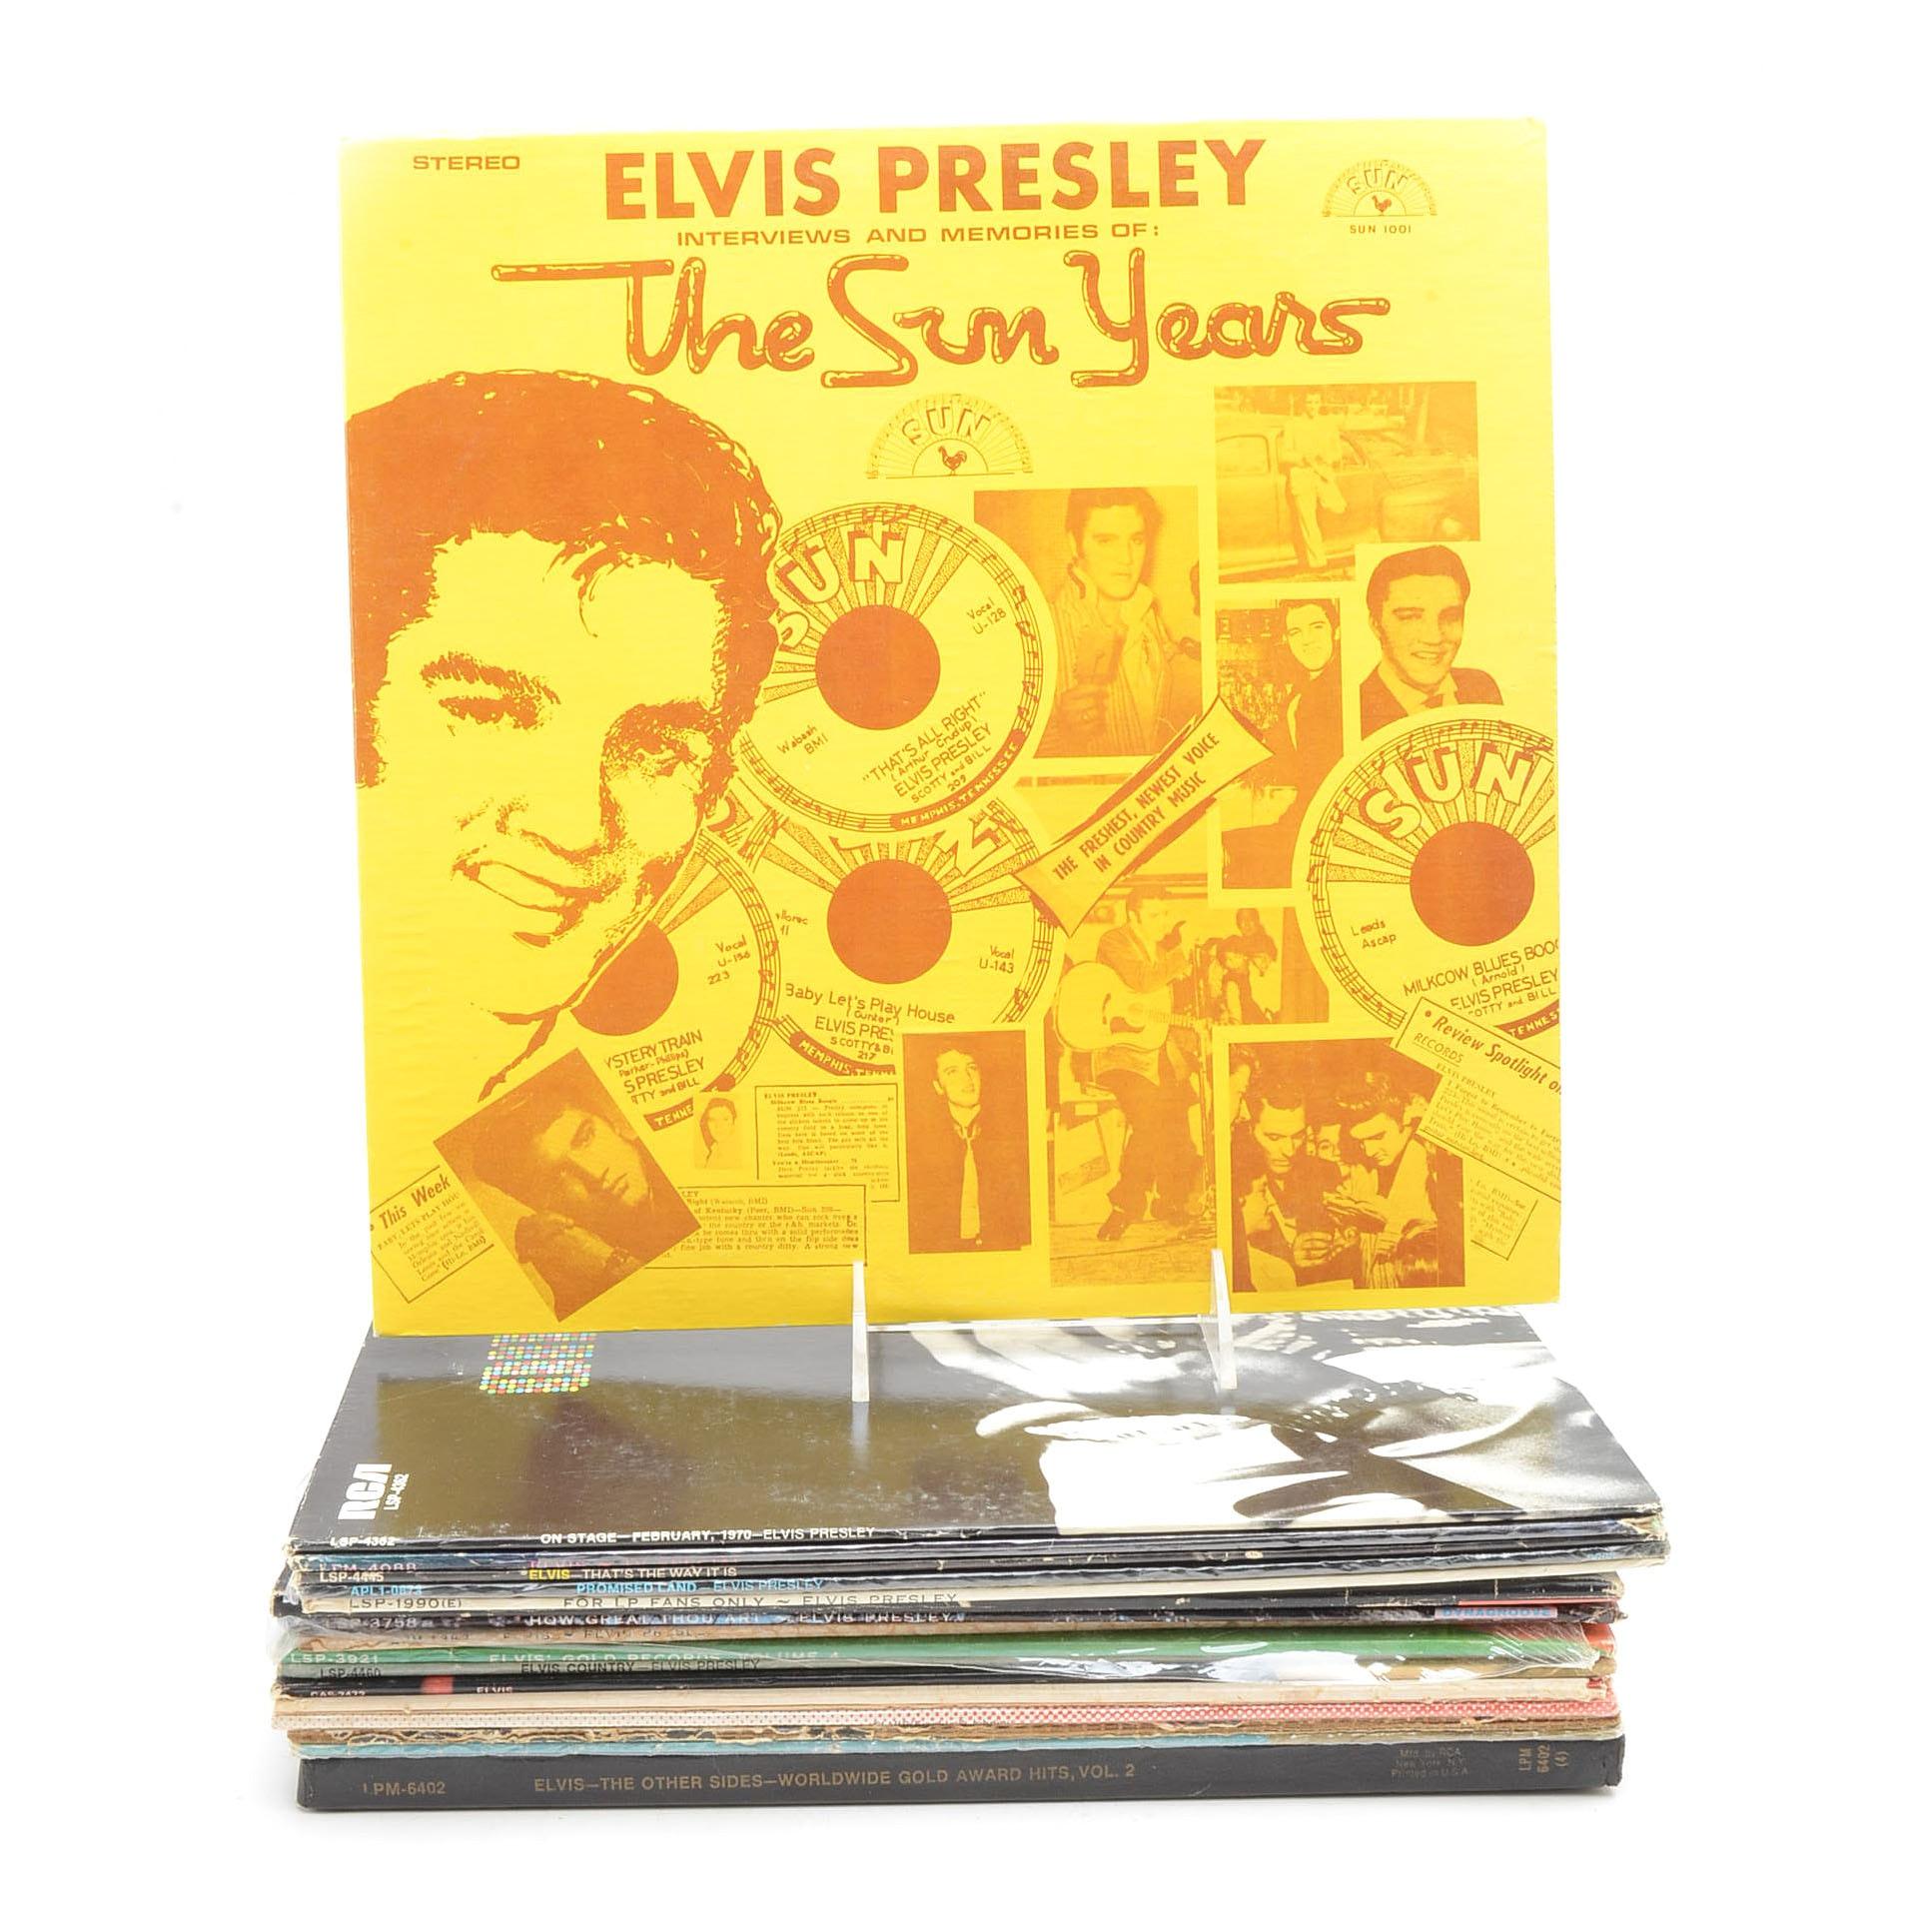 Assortment of Vintage Elvis LPs